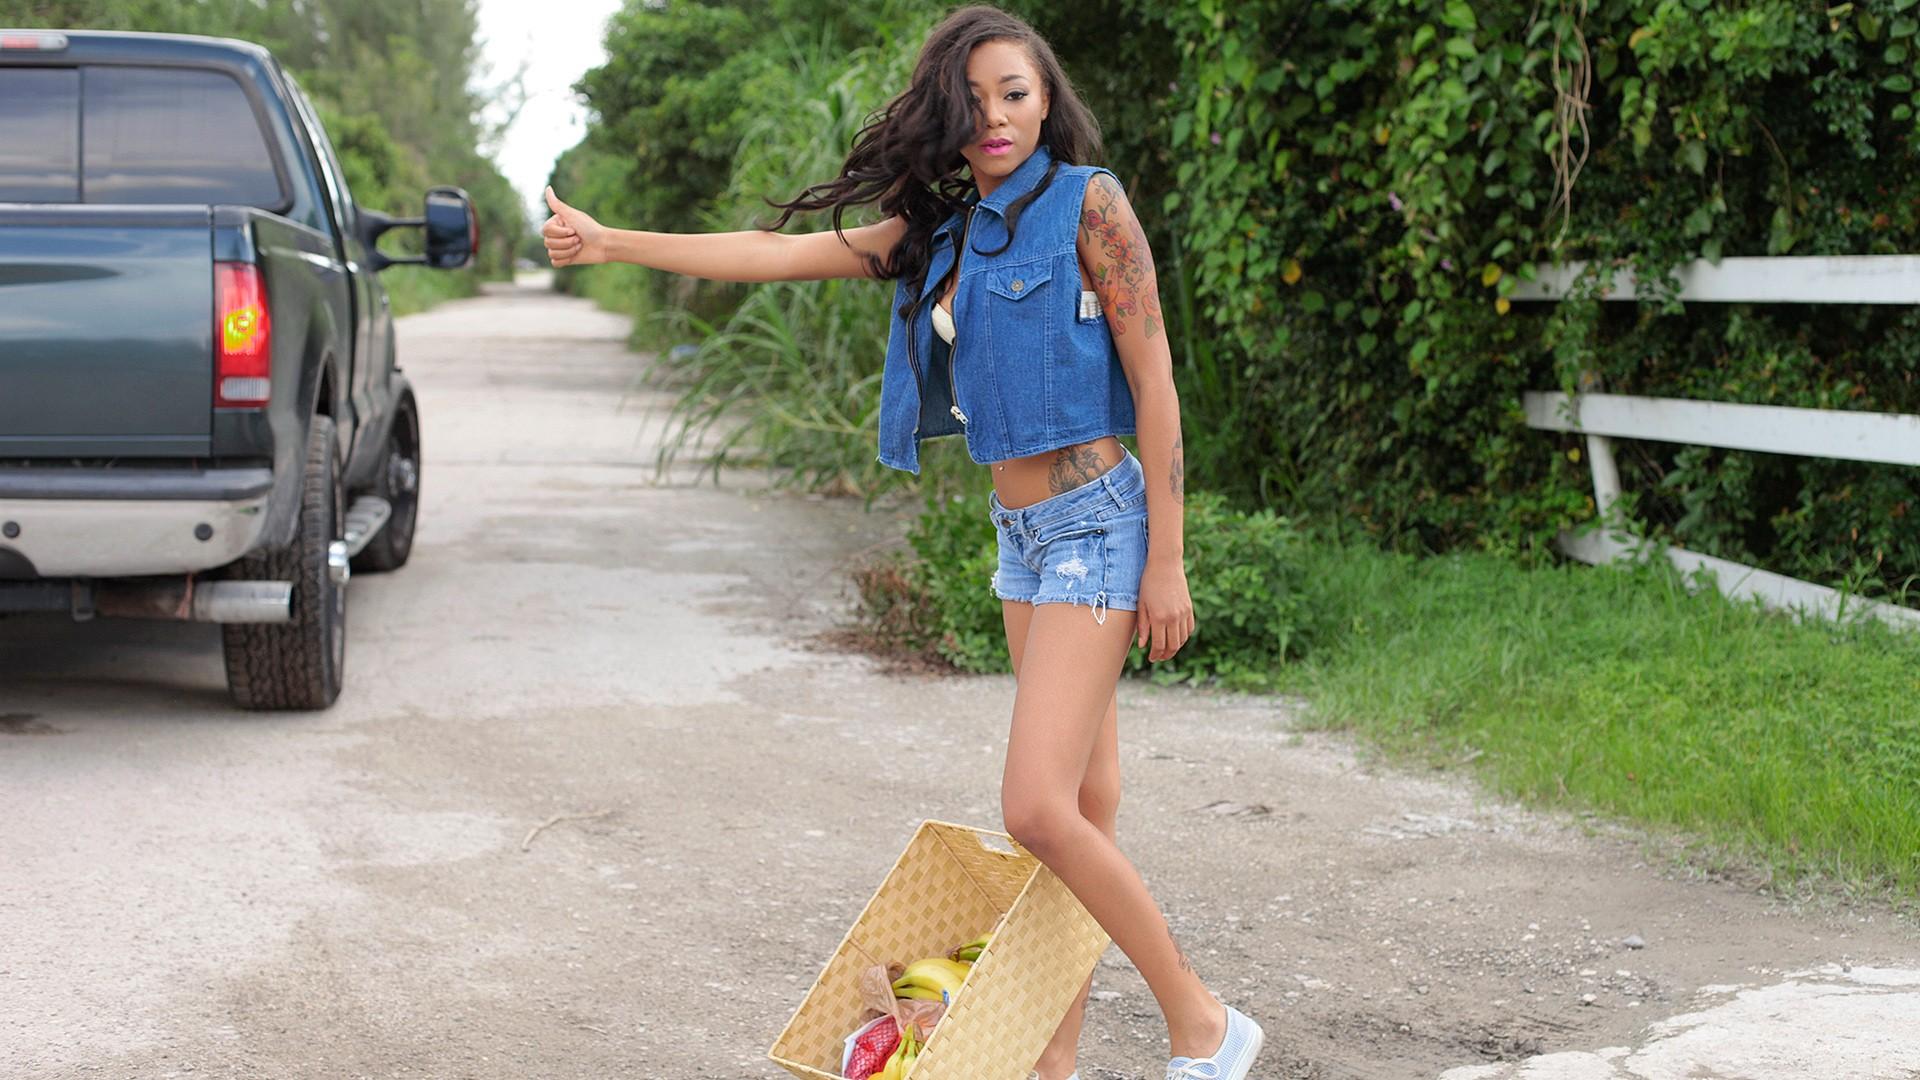 Picking Up an Ebony Teen - Stranded Teens